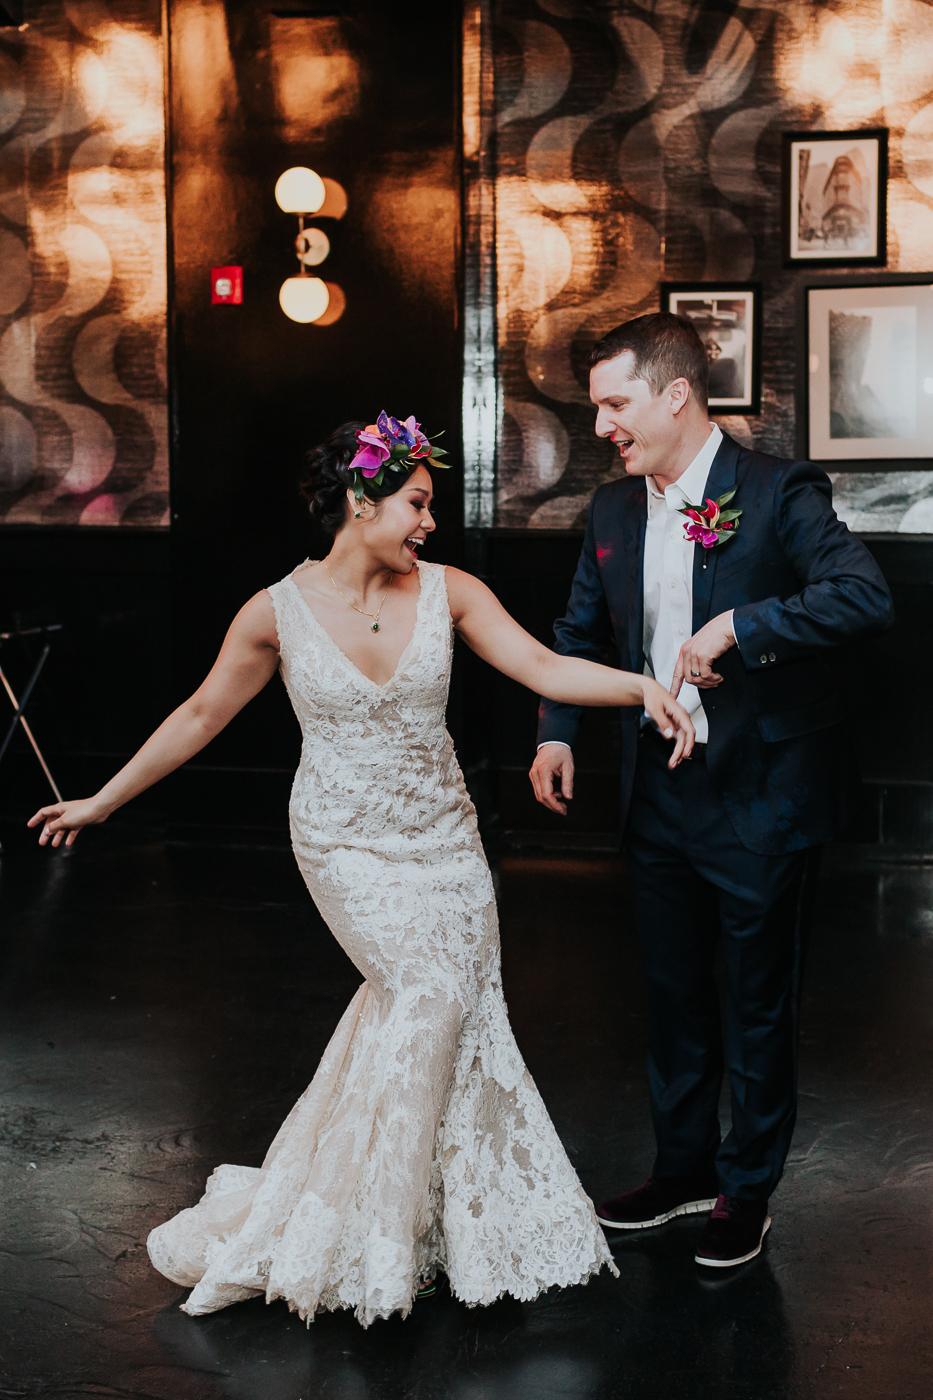 501-Union-Brooklyn-Documentary-Wedding-Photographer-111.jpg